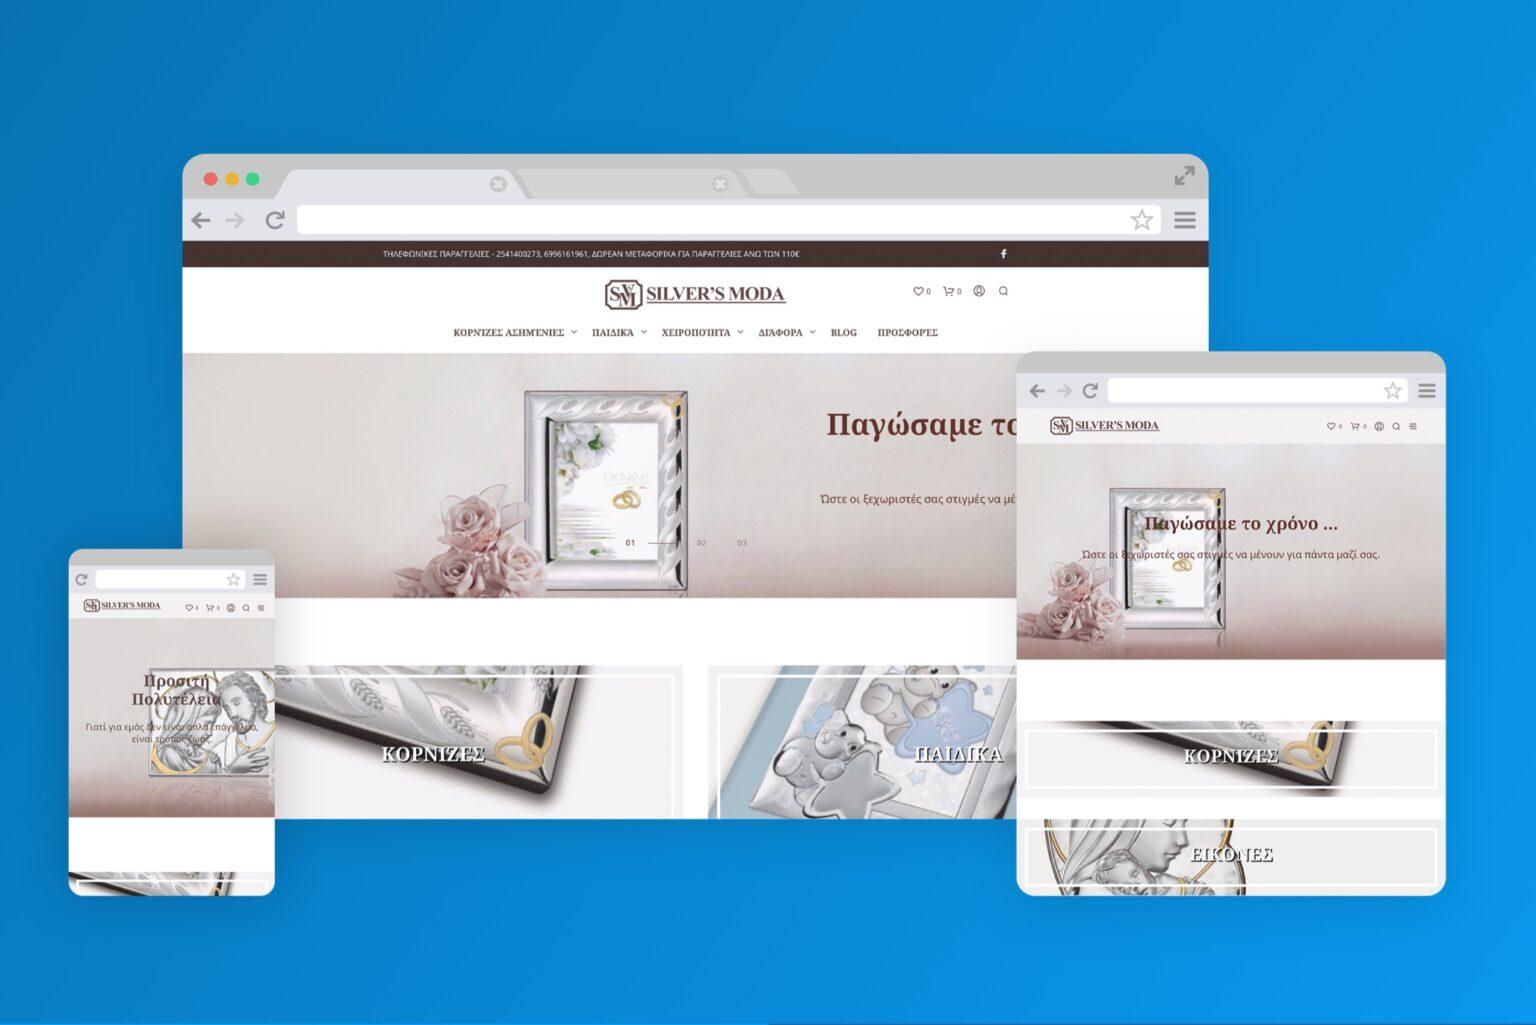 silversmoda.gr website screenshot - codeheaven studios portfolio